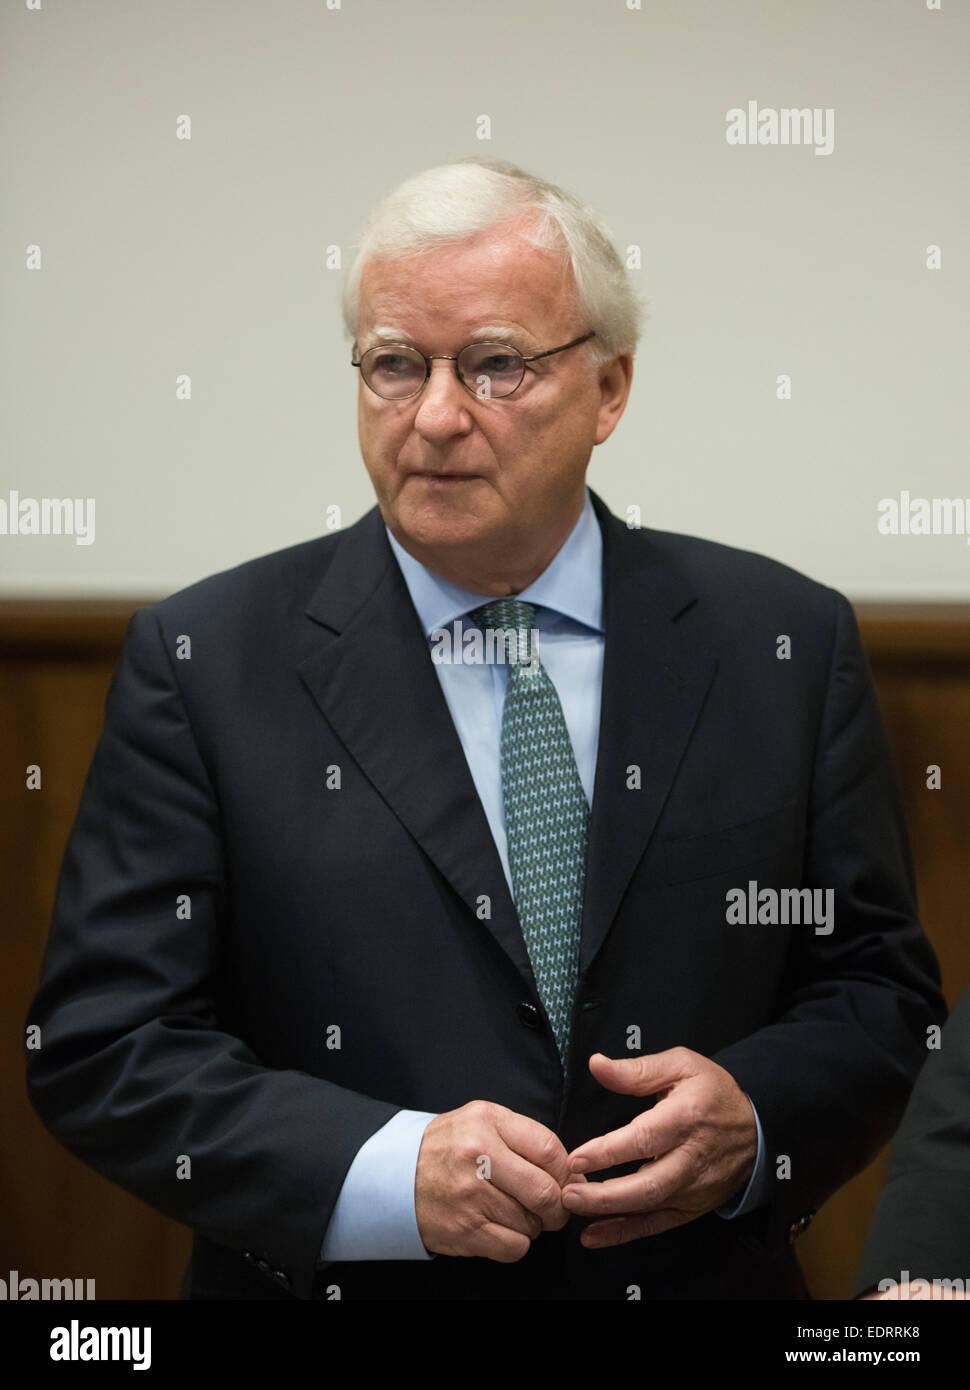 Dortmund, Germany. 09th Jan, 2015. Former president of the German Bundesliga soccer team Borussia Dortmund, Gerd - Stock Image